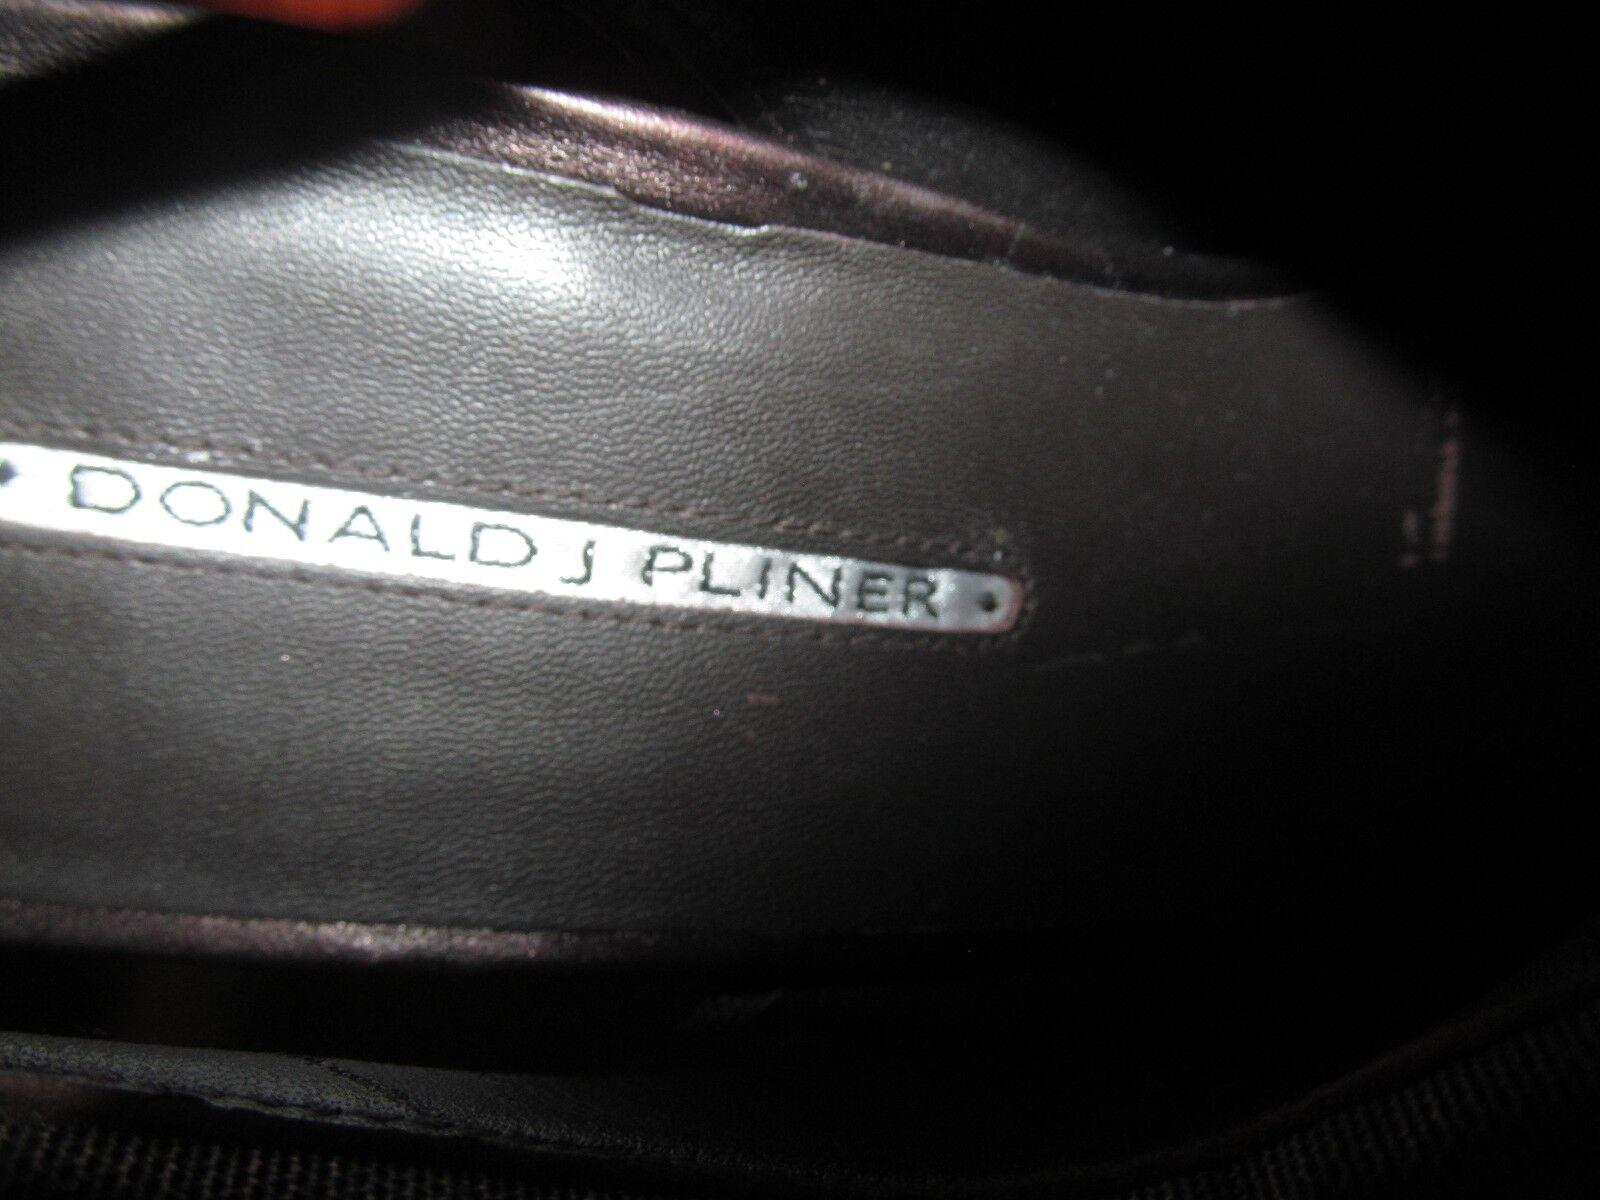 Donald Donald Donald J Pliner Women's Anya Sandal,Expresso,SZ 11 M 040eec